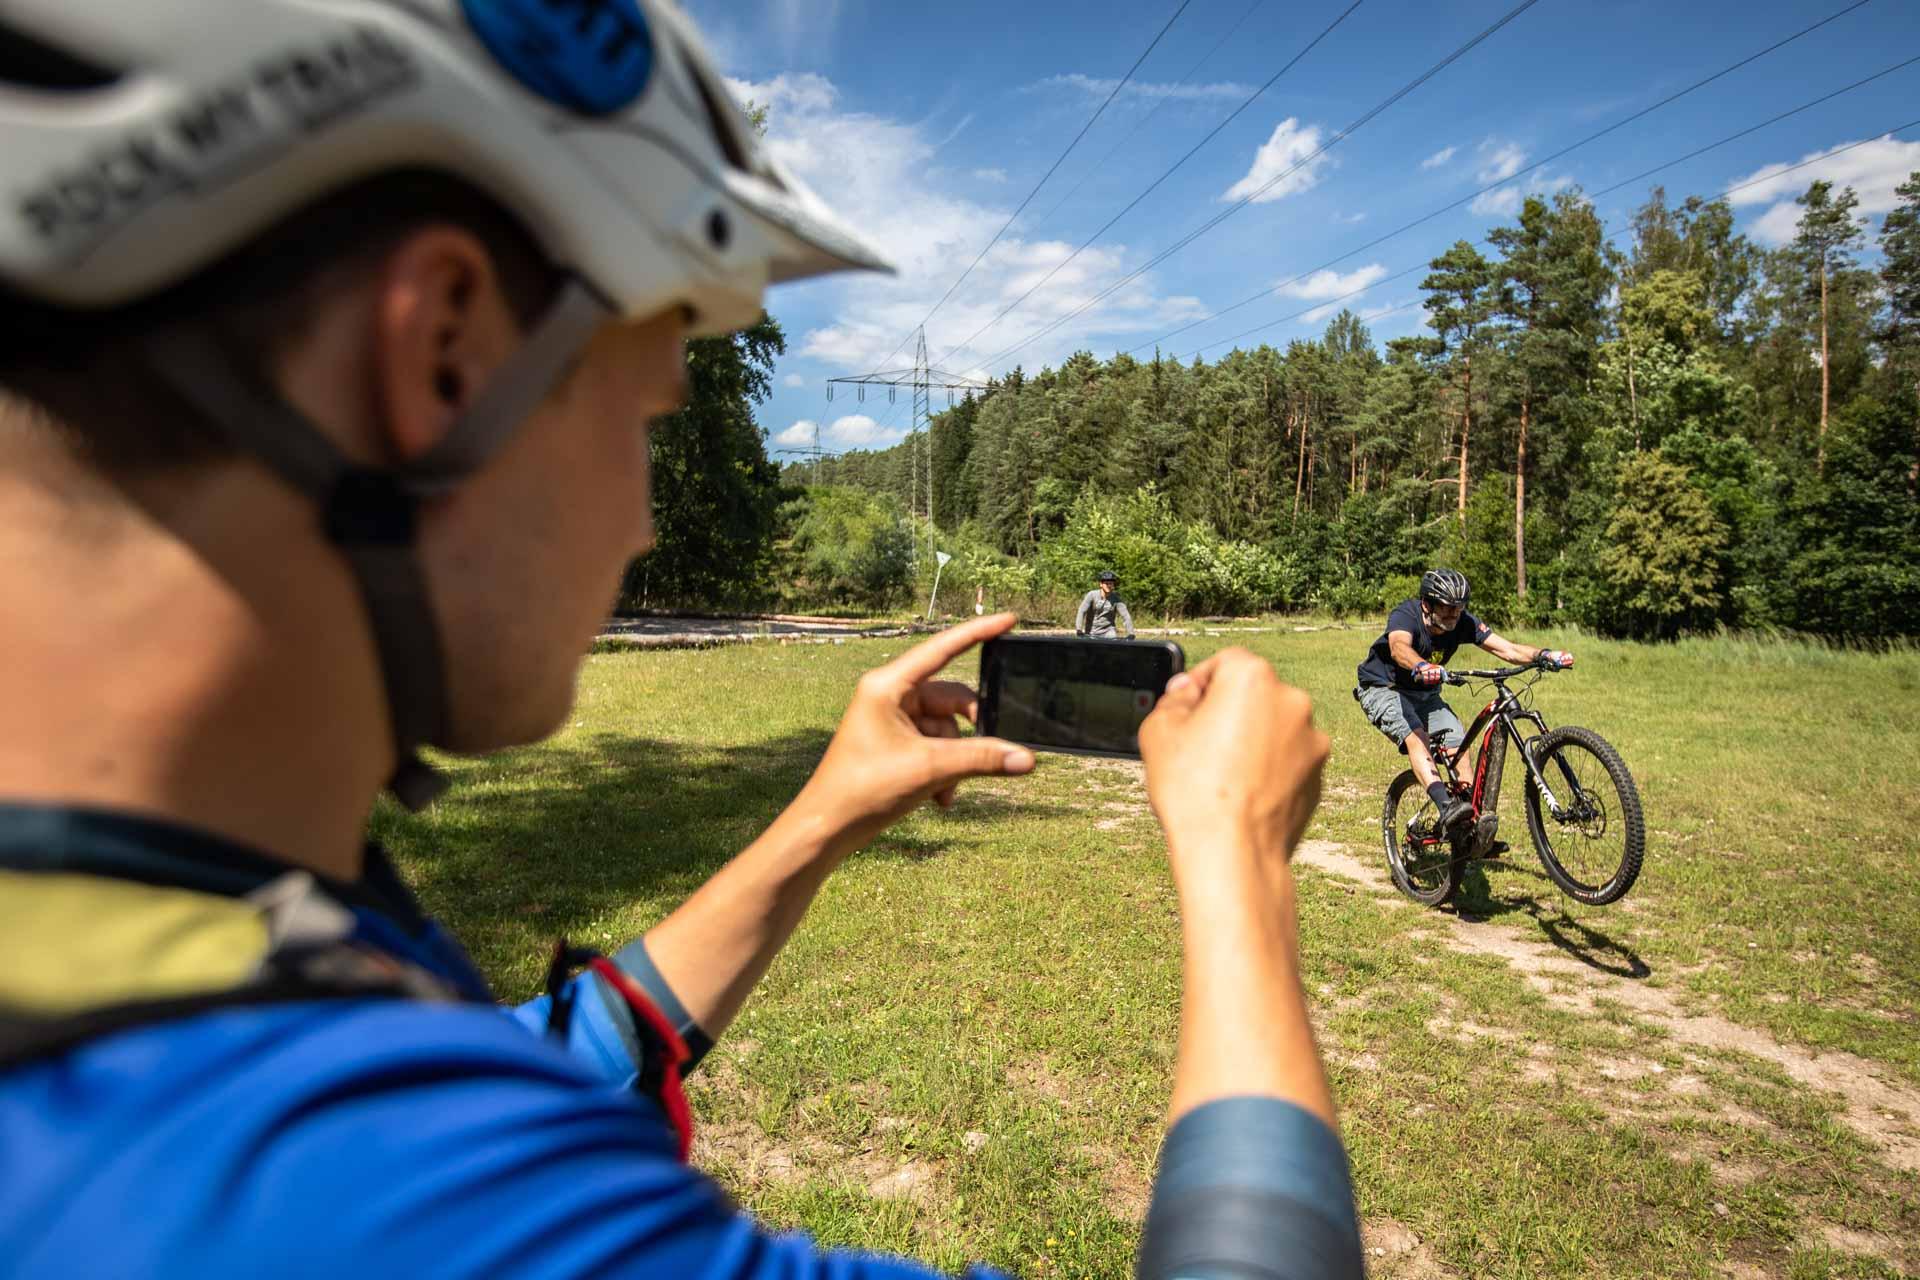 eMTB eBike Fortgeschritten Fahrtechnik Kurs in Siegen - Rock my Trail Bikeschule33